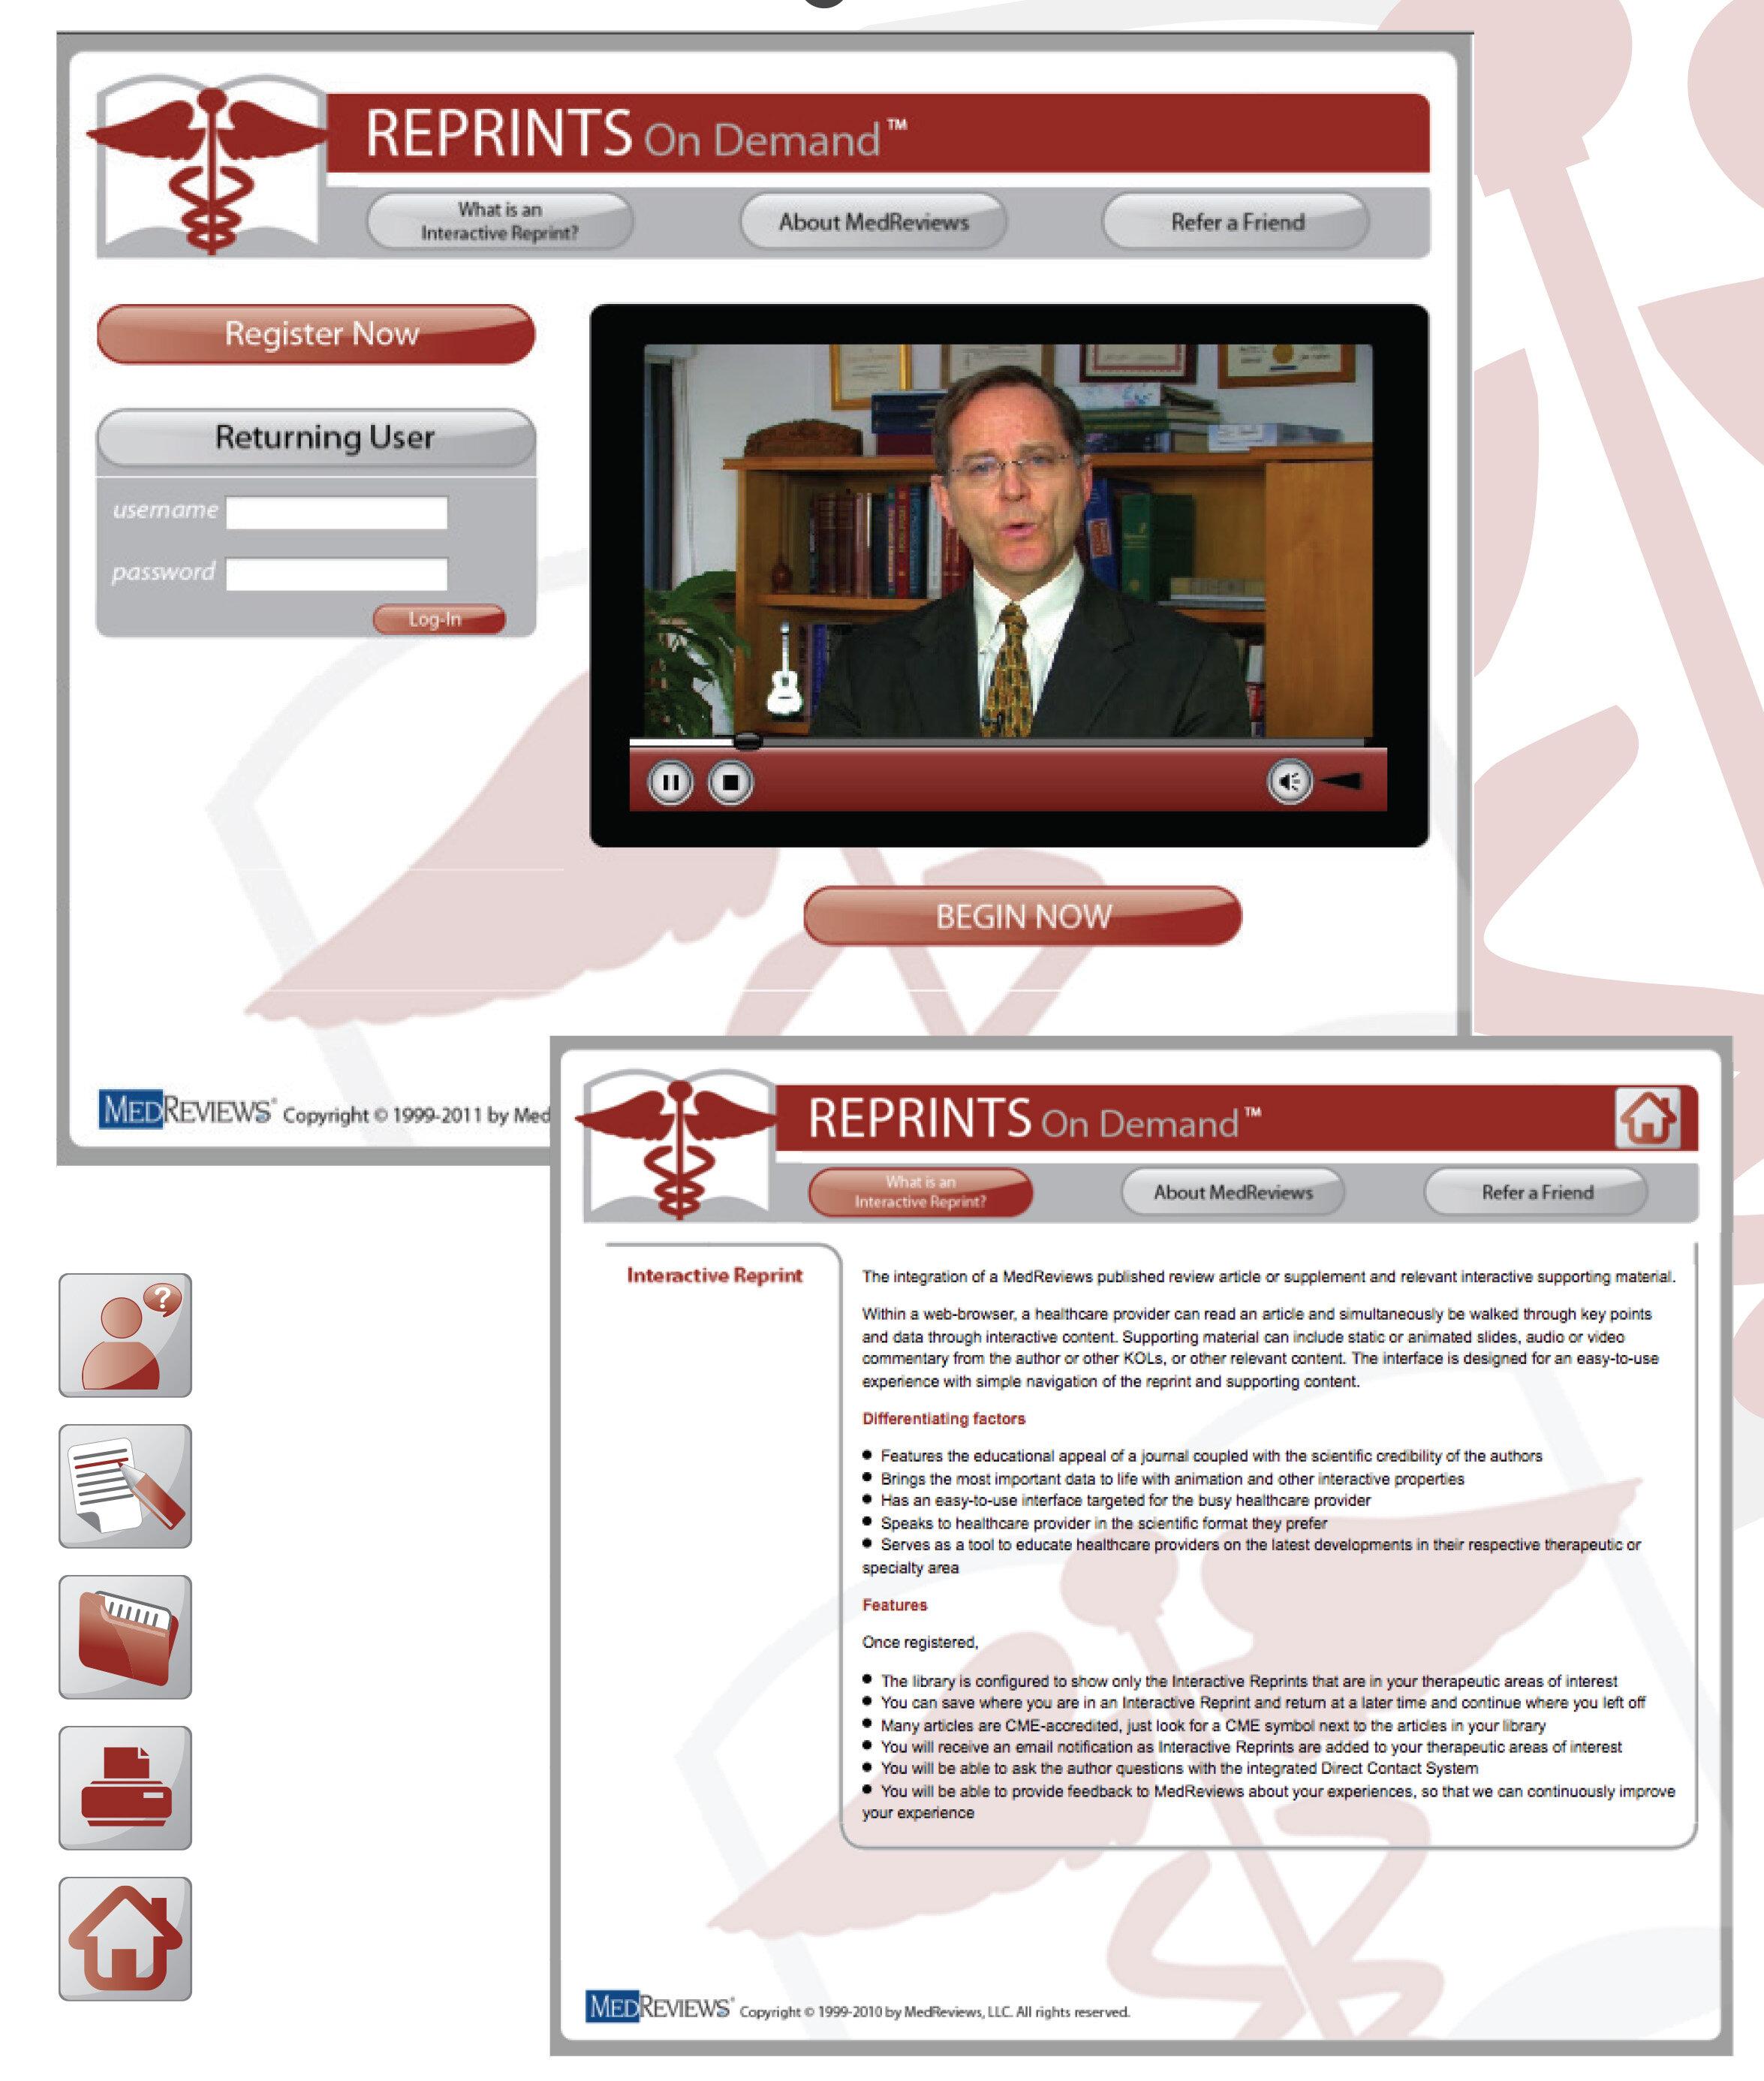 Web images 1.jpg